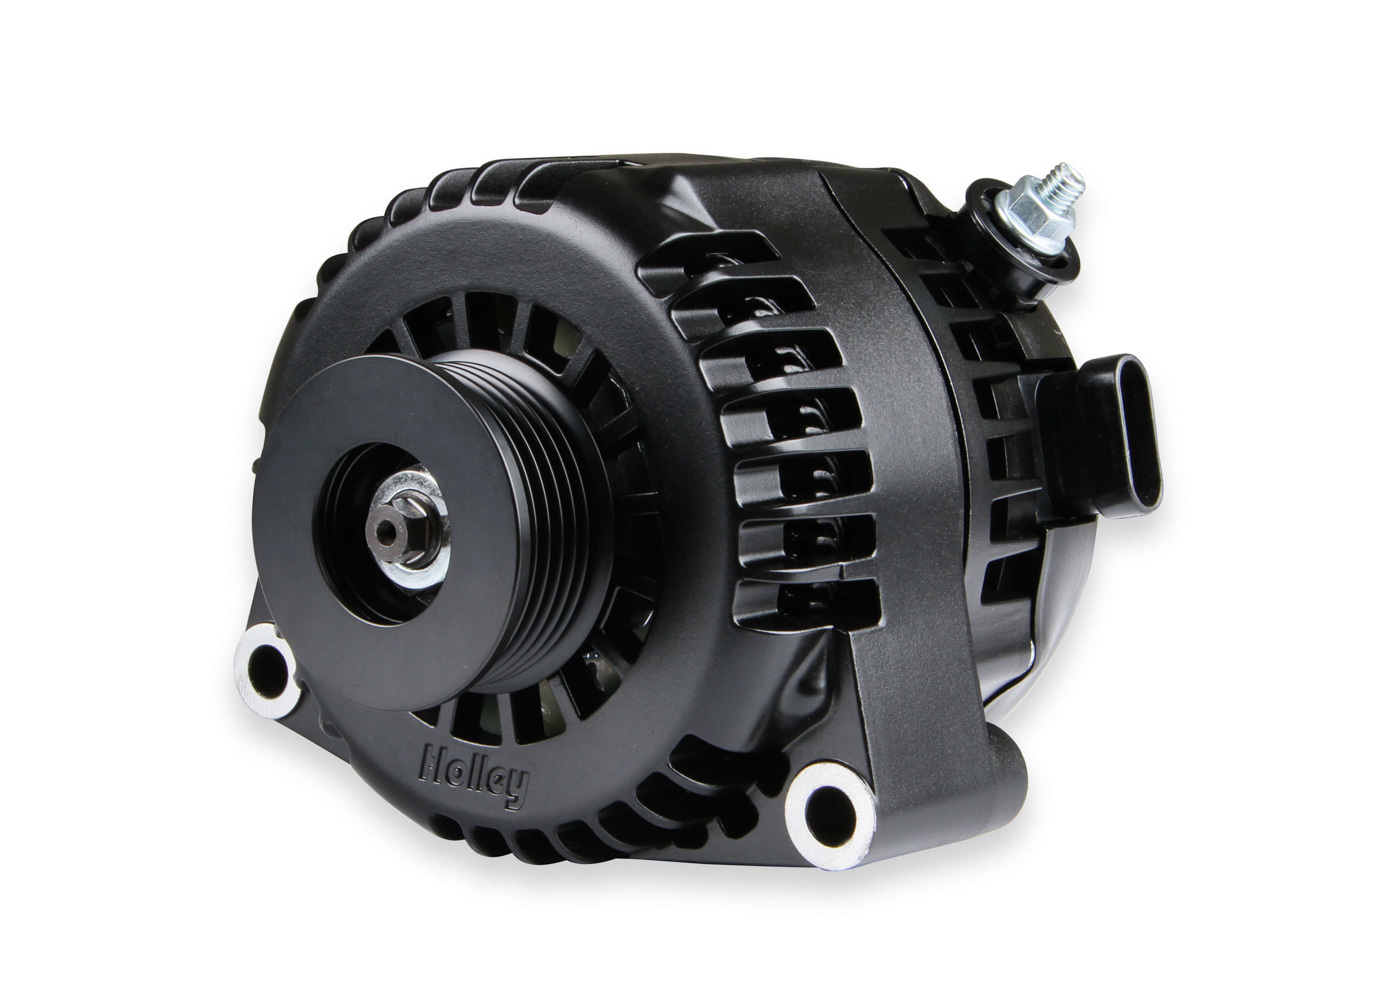 Holley 197-303 Alternator, 150 amp, 12V, Internal Regulator, 6 Rib Serpentine Pulley, OE Plug / 1 Wire, Aluminum, Black, GM LS-Series, Each